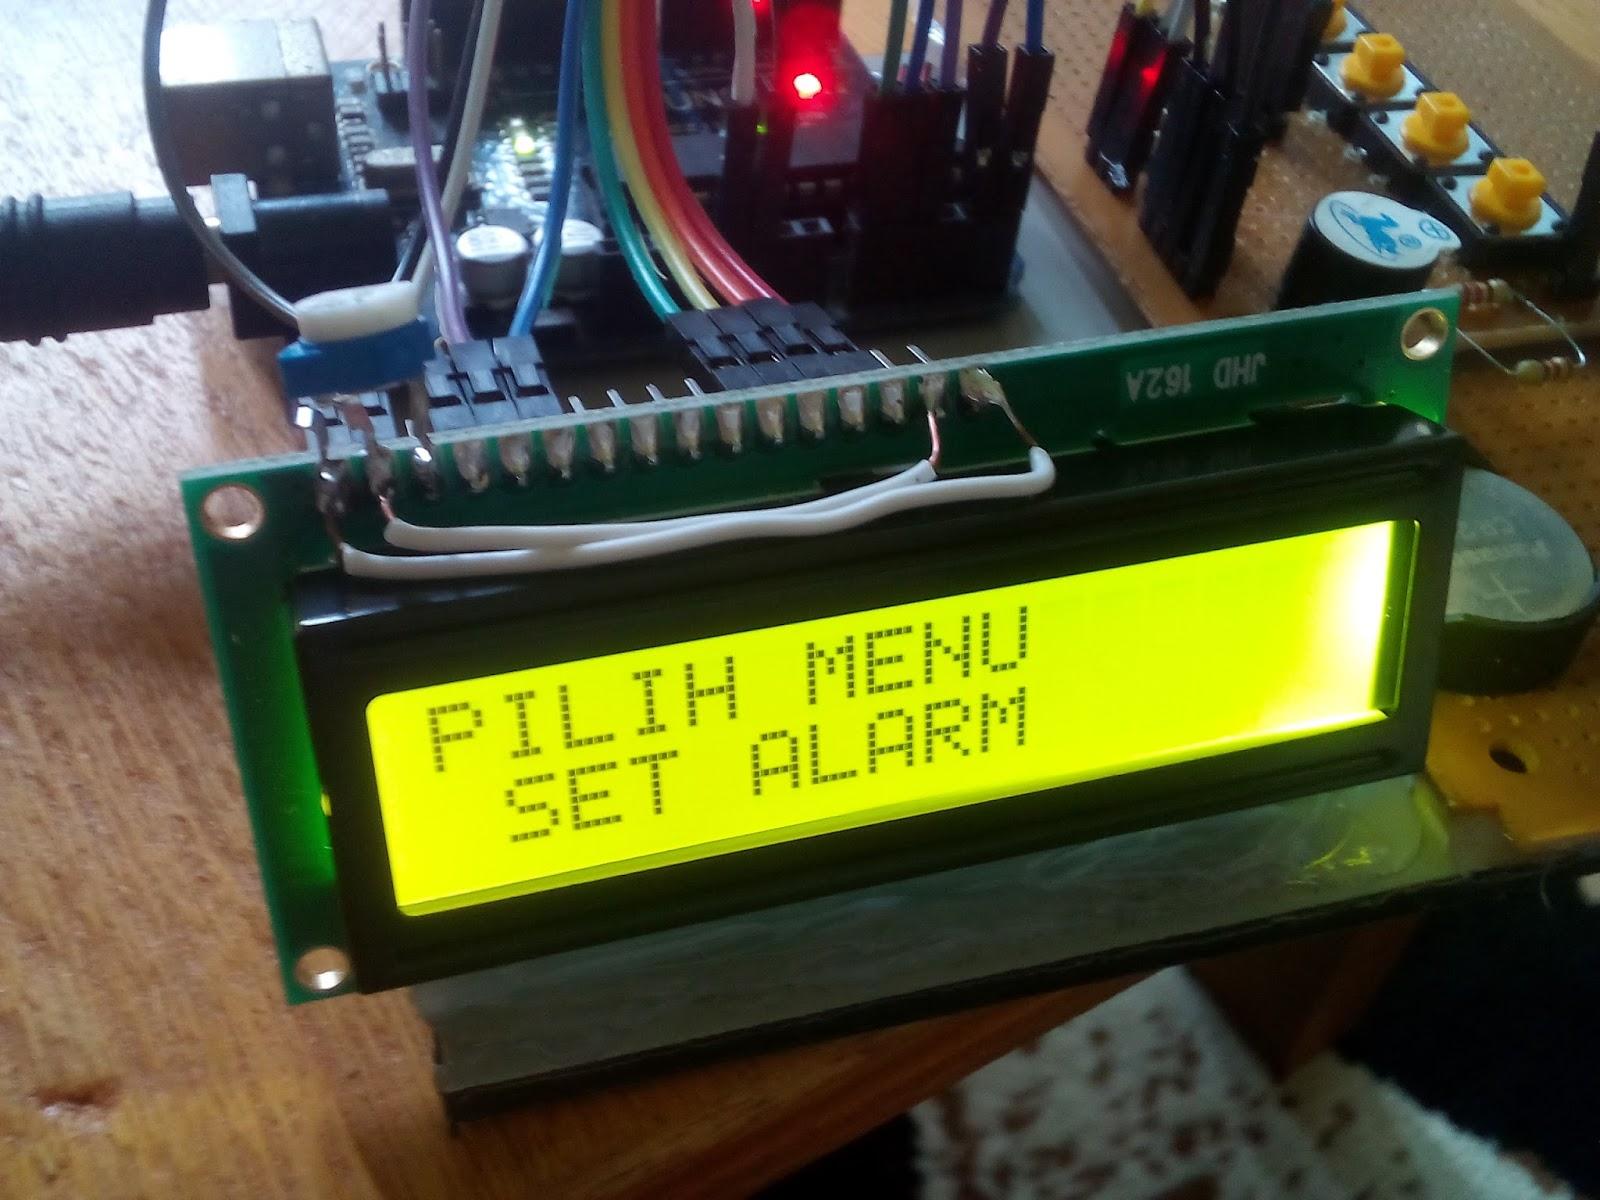 Membuat JAM DIGITAL dilengkapi SET ALARM dan STOPWATCH menggunakan ... 641e04b957